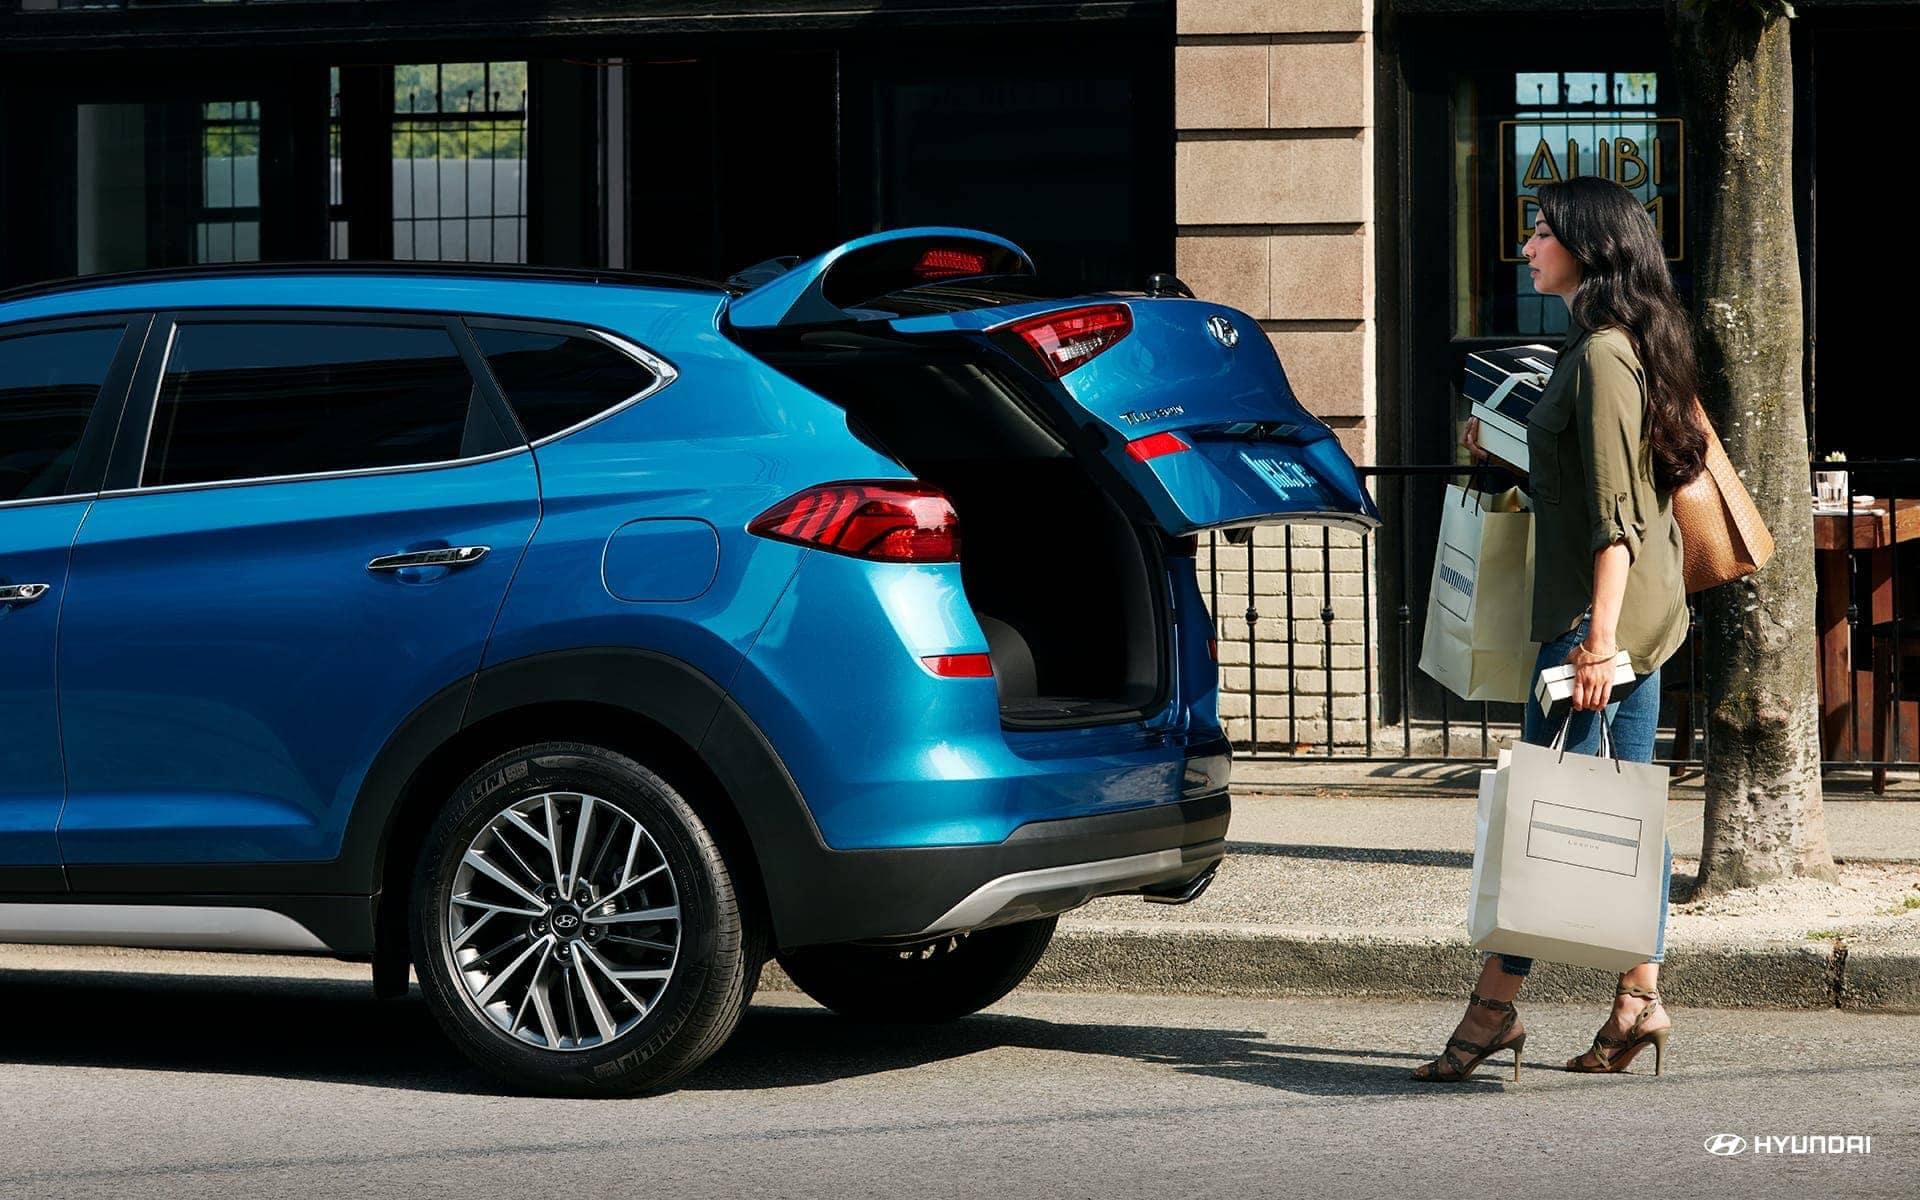 2019-Hyundai-Tucson-hands-free-smart-liftgate